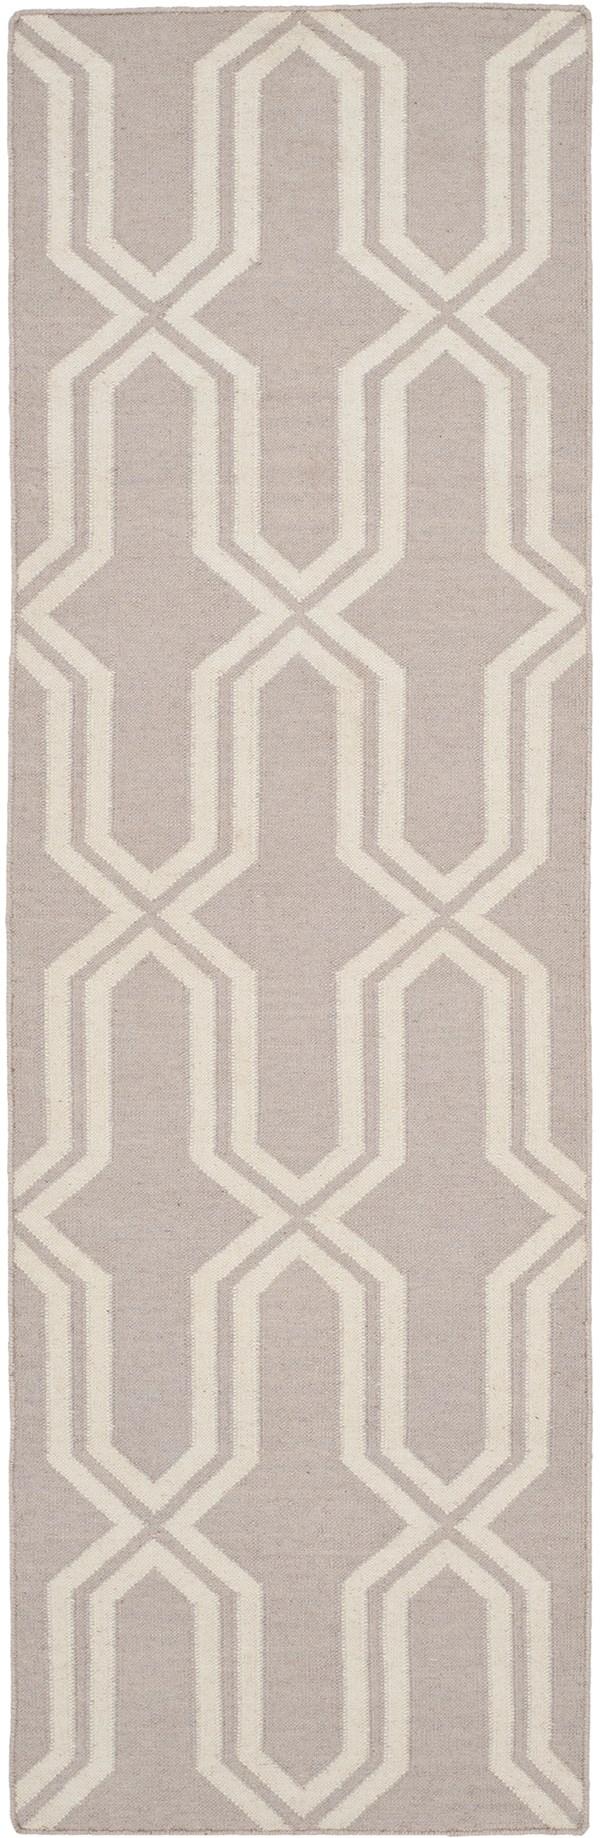 Grey, Ivory (G) Moroccan Area Rug